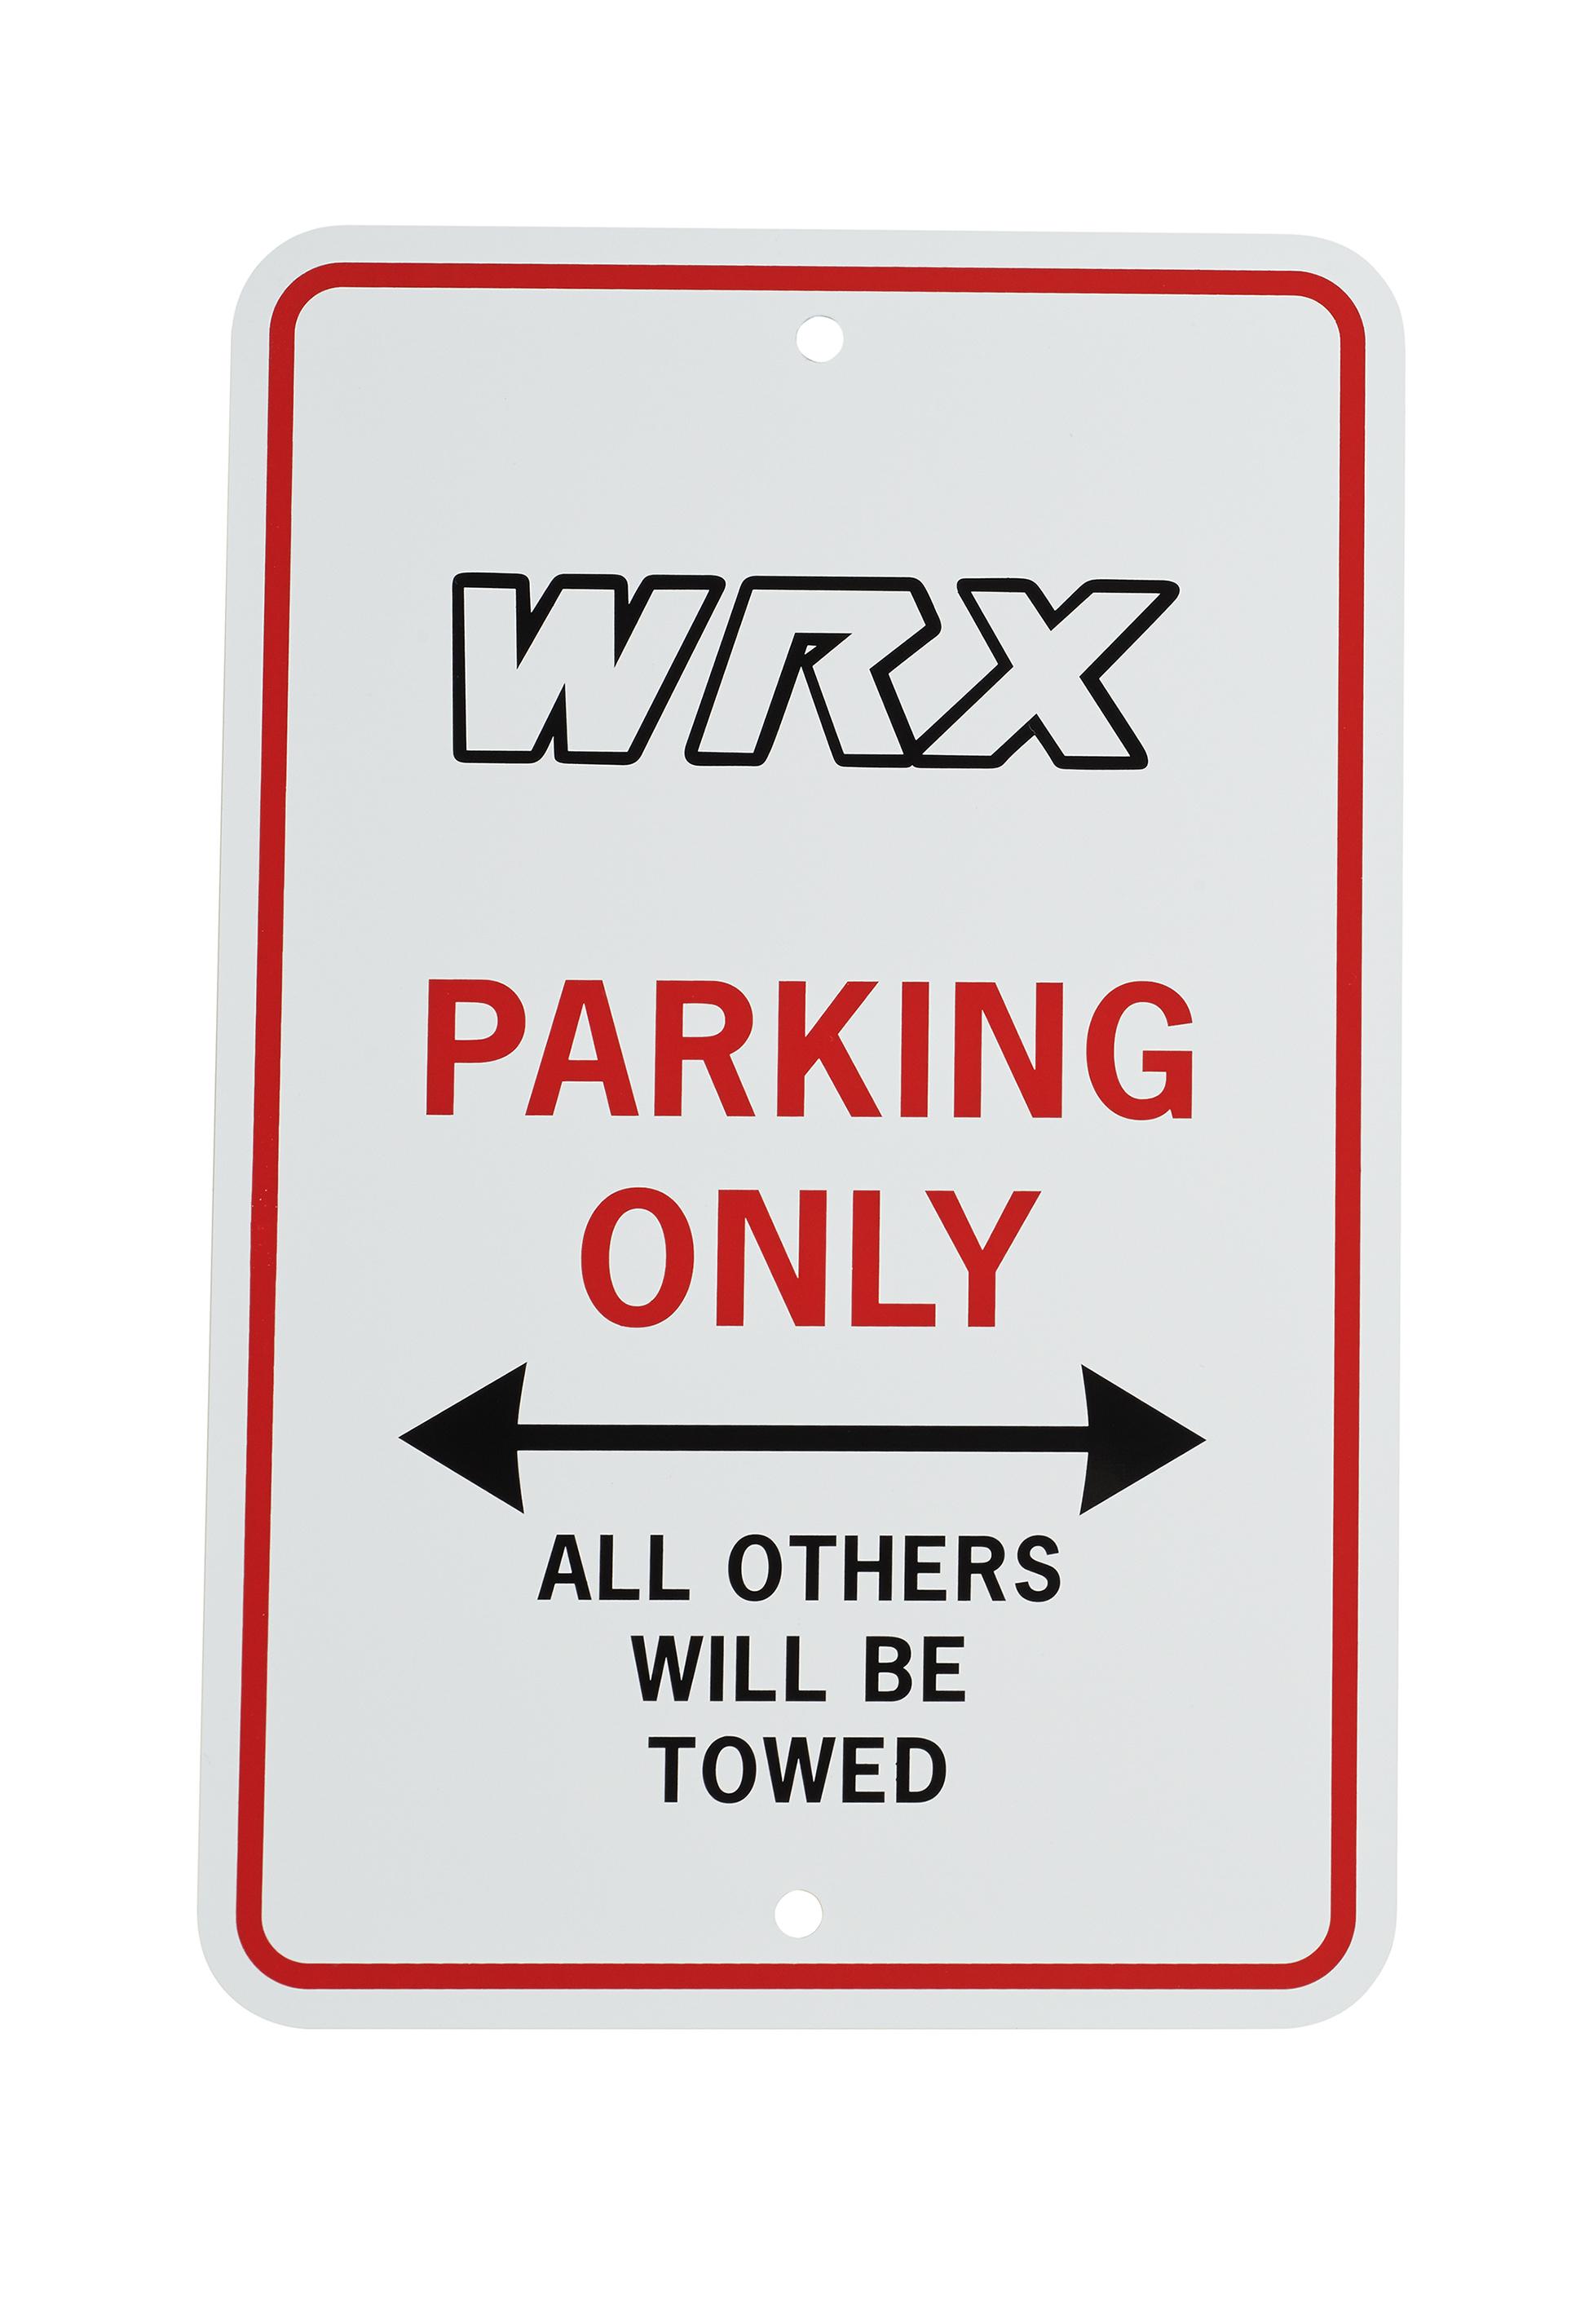 2018 subaru sti parking only sign wrx soa342l150 sheehy subaru springfield va. Black Bedroom Furniture Sets. Home Design Ideas